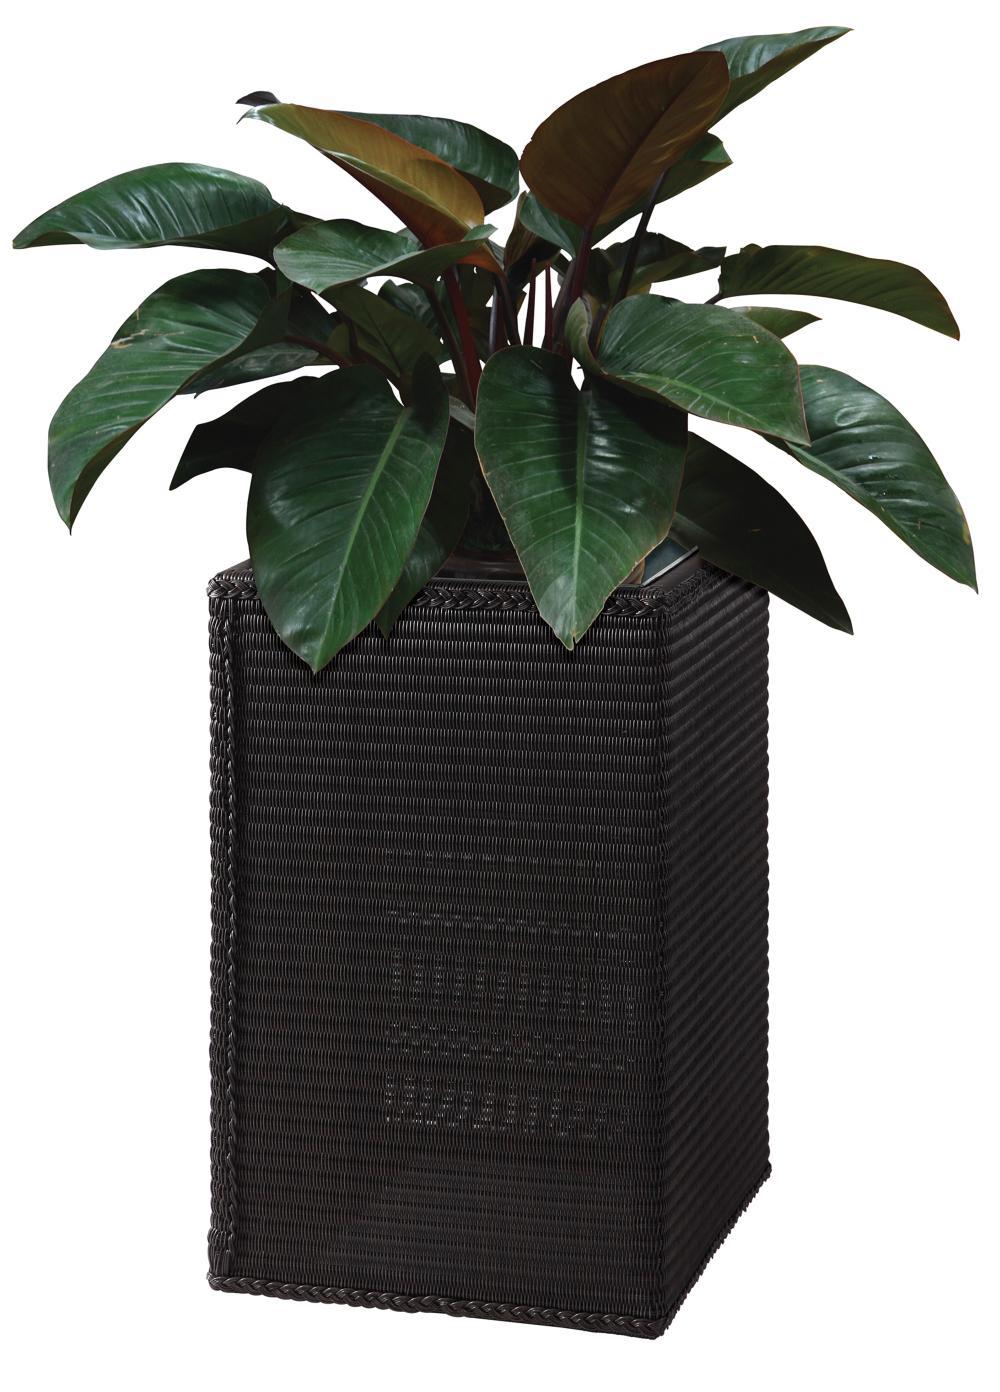 Popular patio garden aluminumfurniture rattan outdoor flowerpot